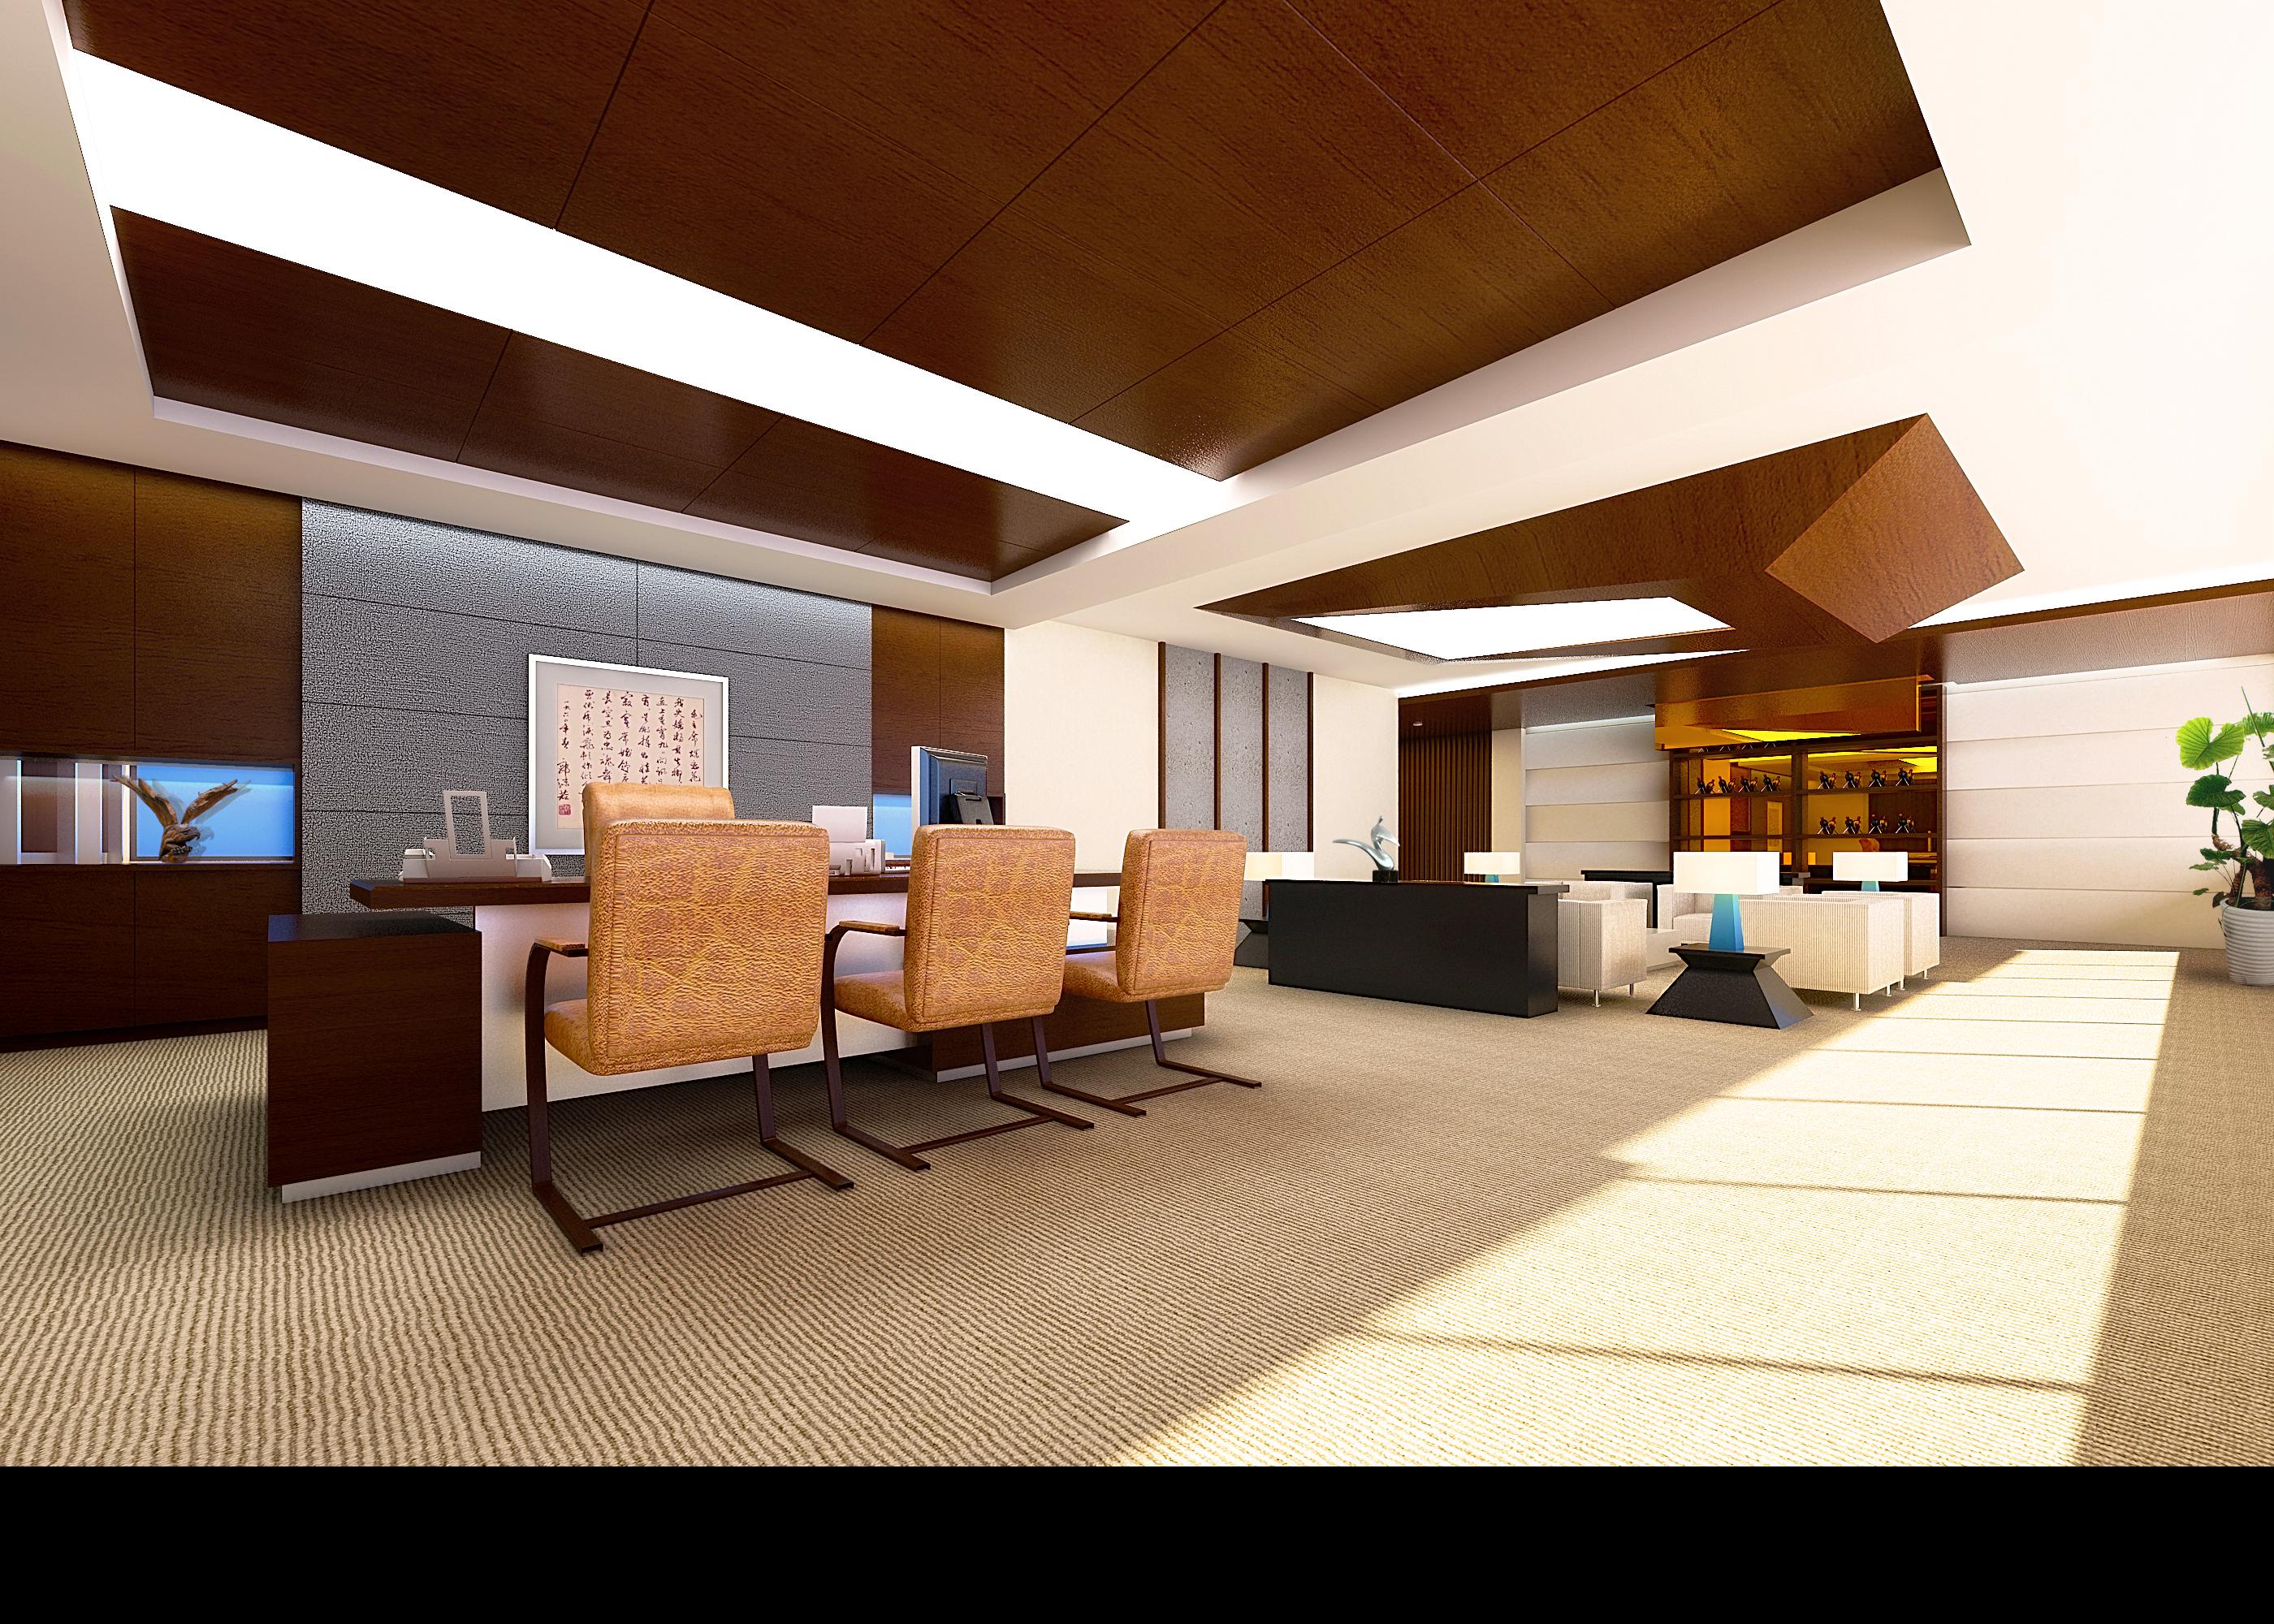 office 048-1 3d model max 137287